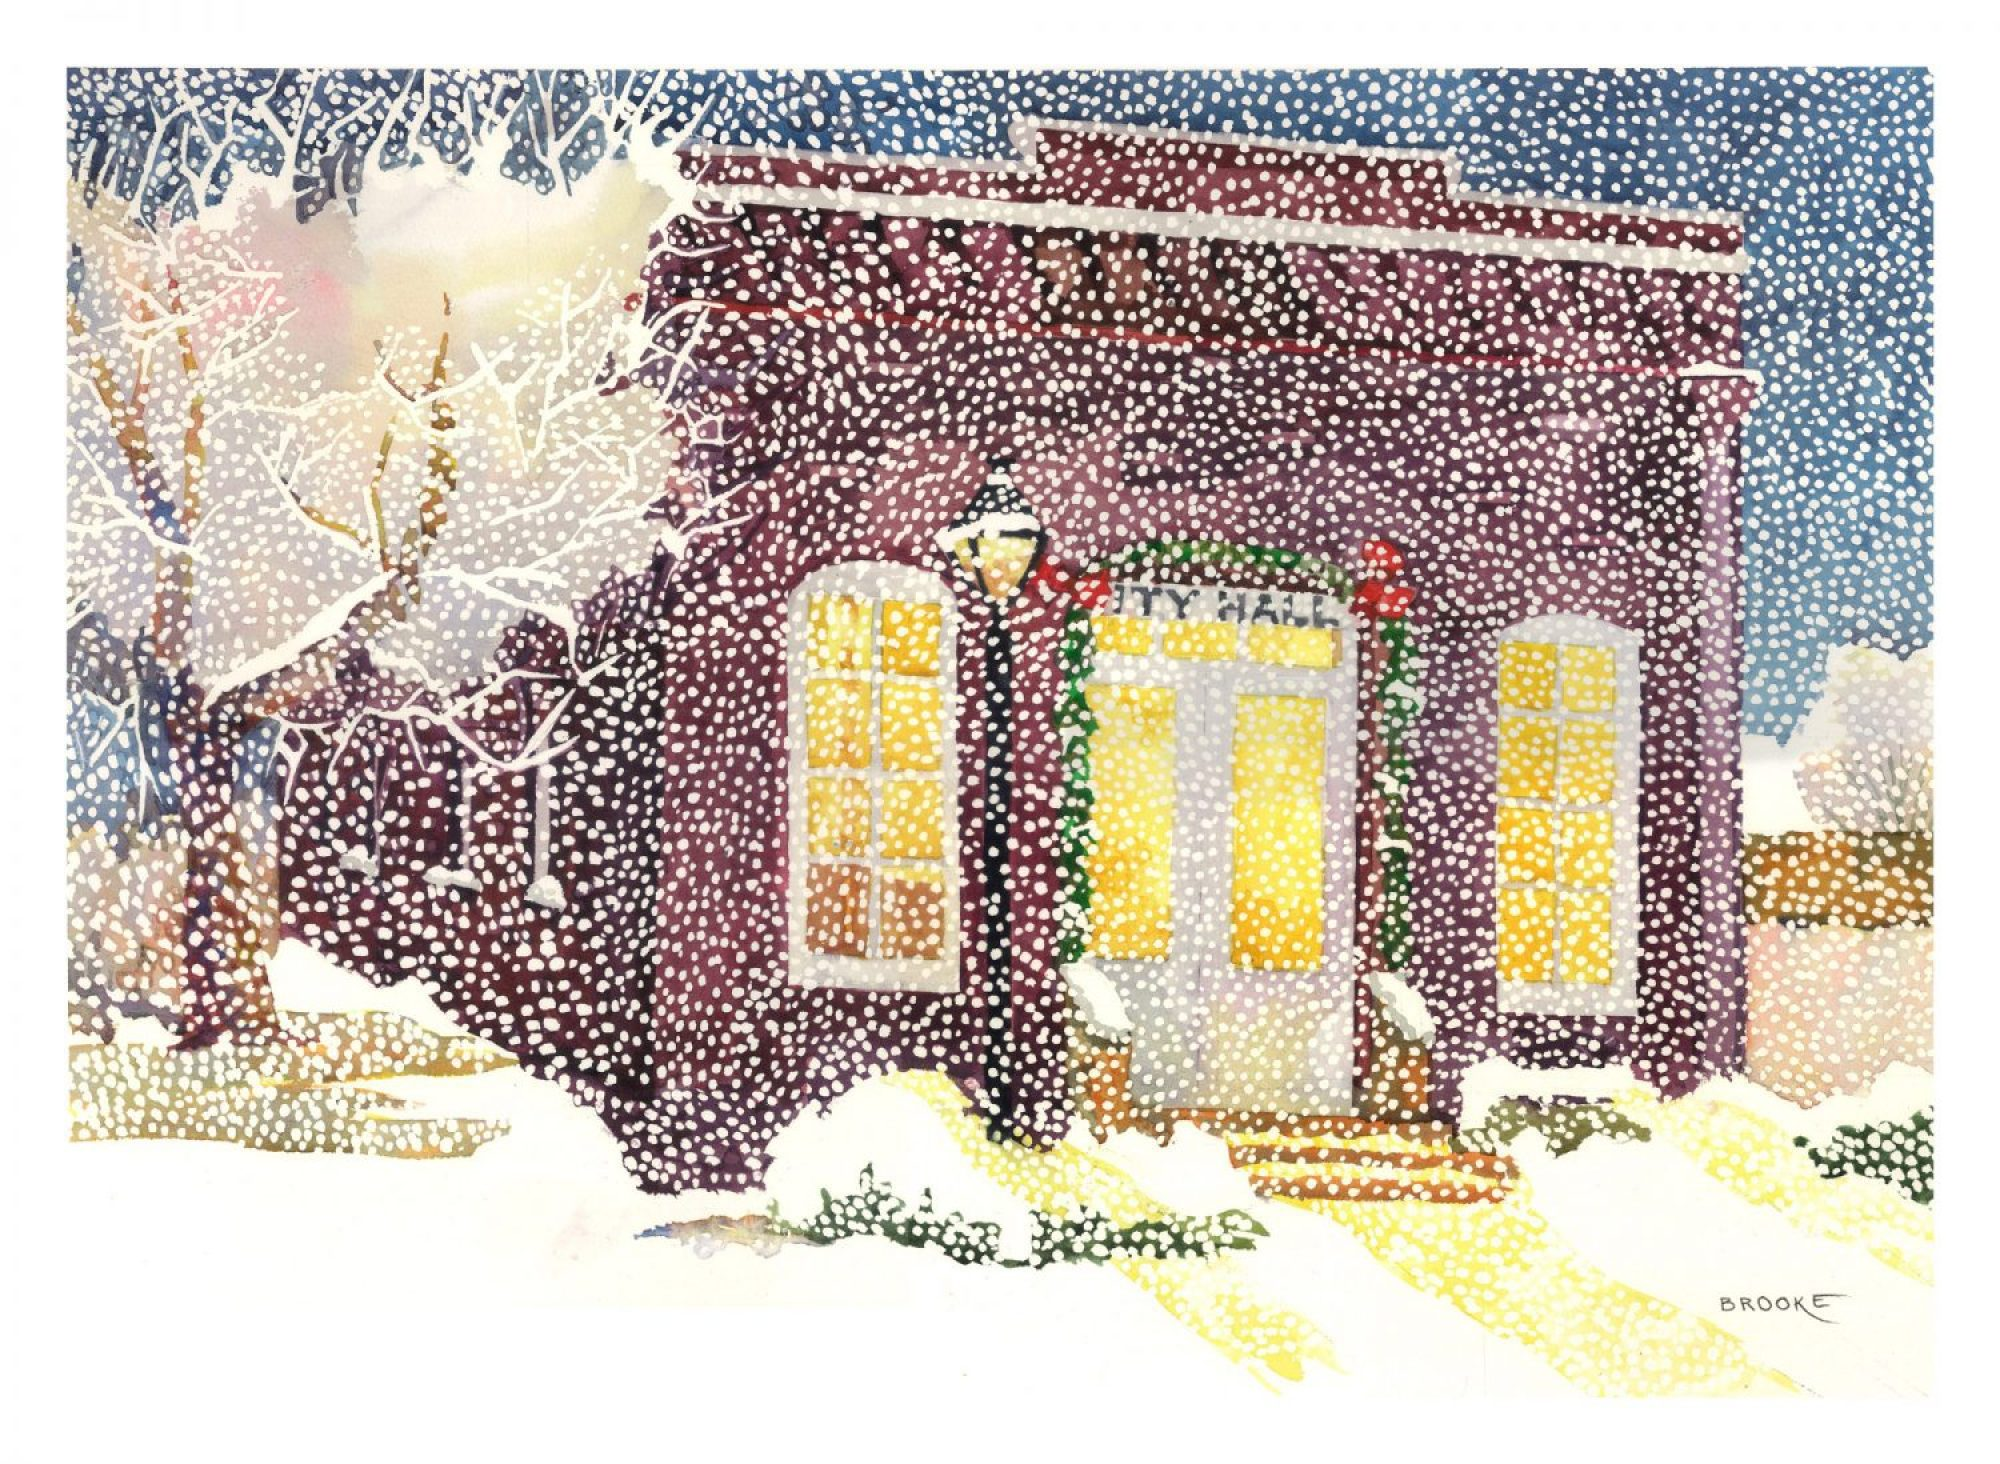 Snowing on City Hall, 1